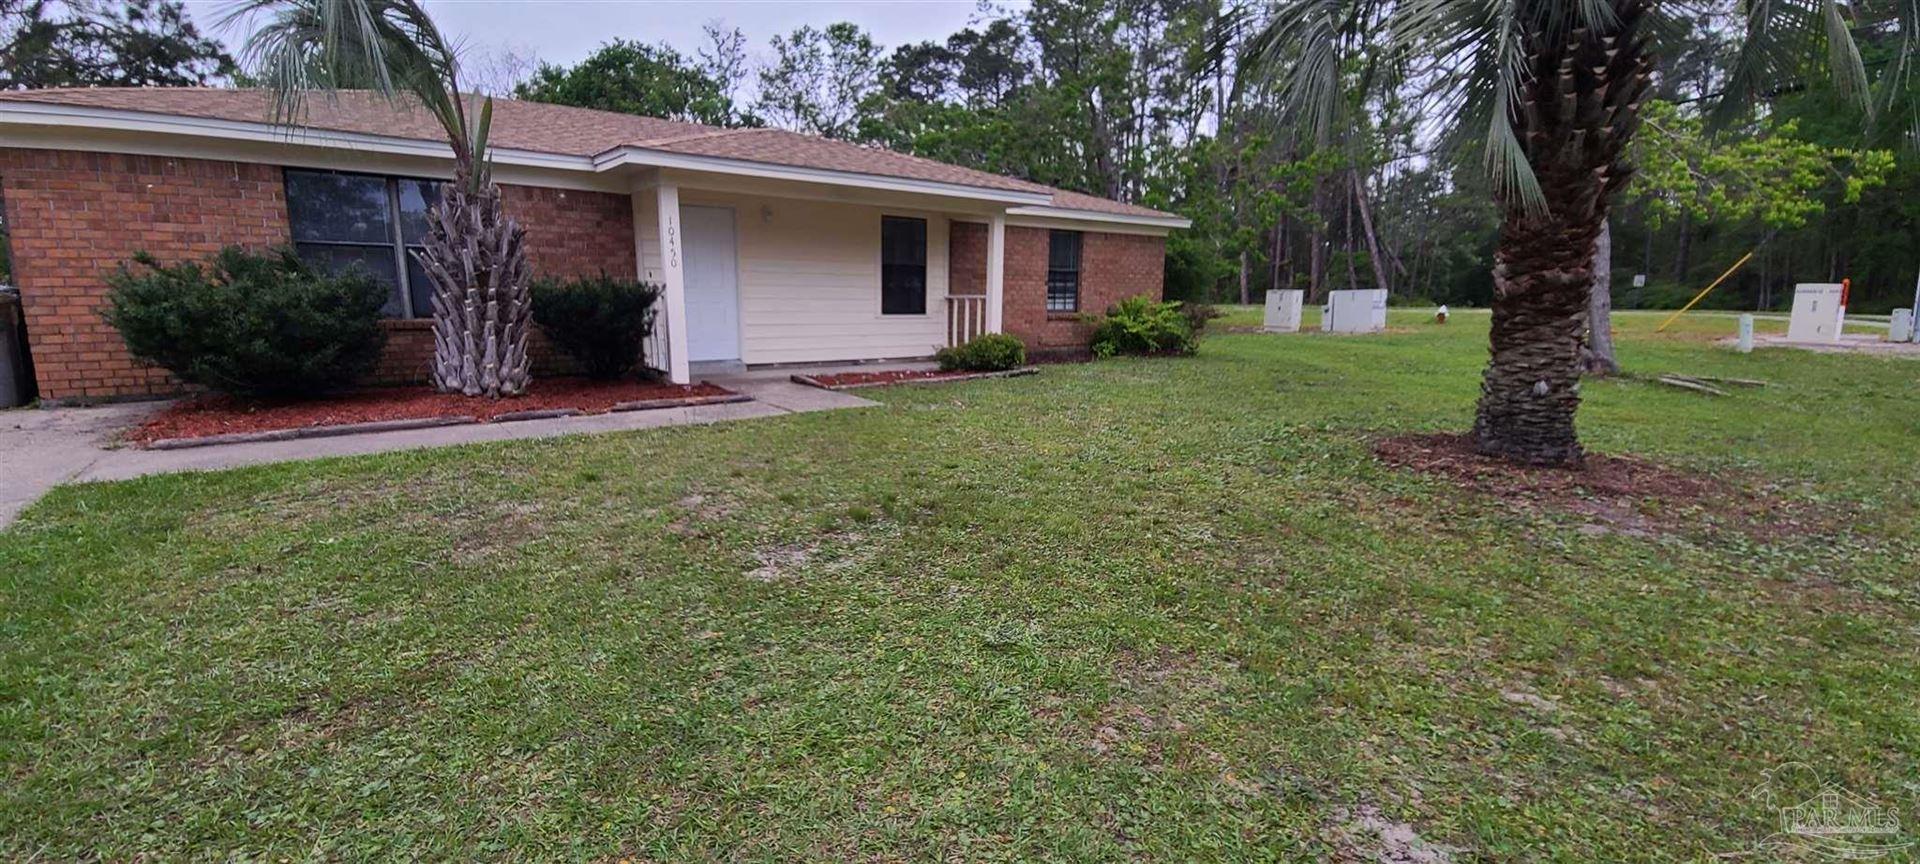 10450 HEATHERWOOD DR, Pensacola, FL 32506 - #: 587827